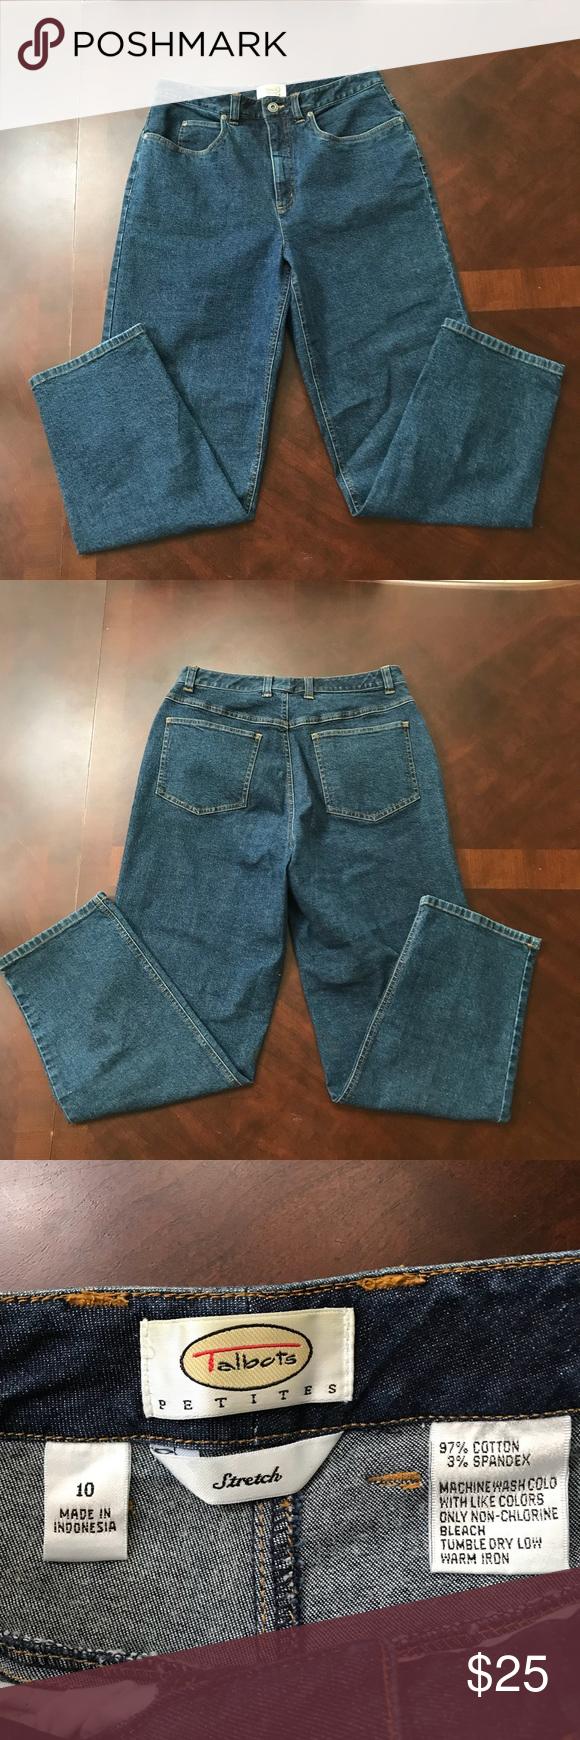 Talbots Petites Stretch Jeans Stretch jeans, Talbots